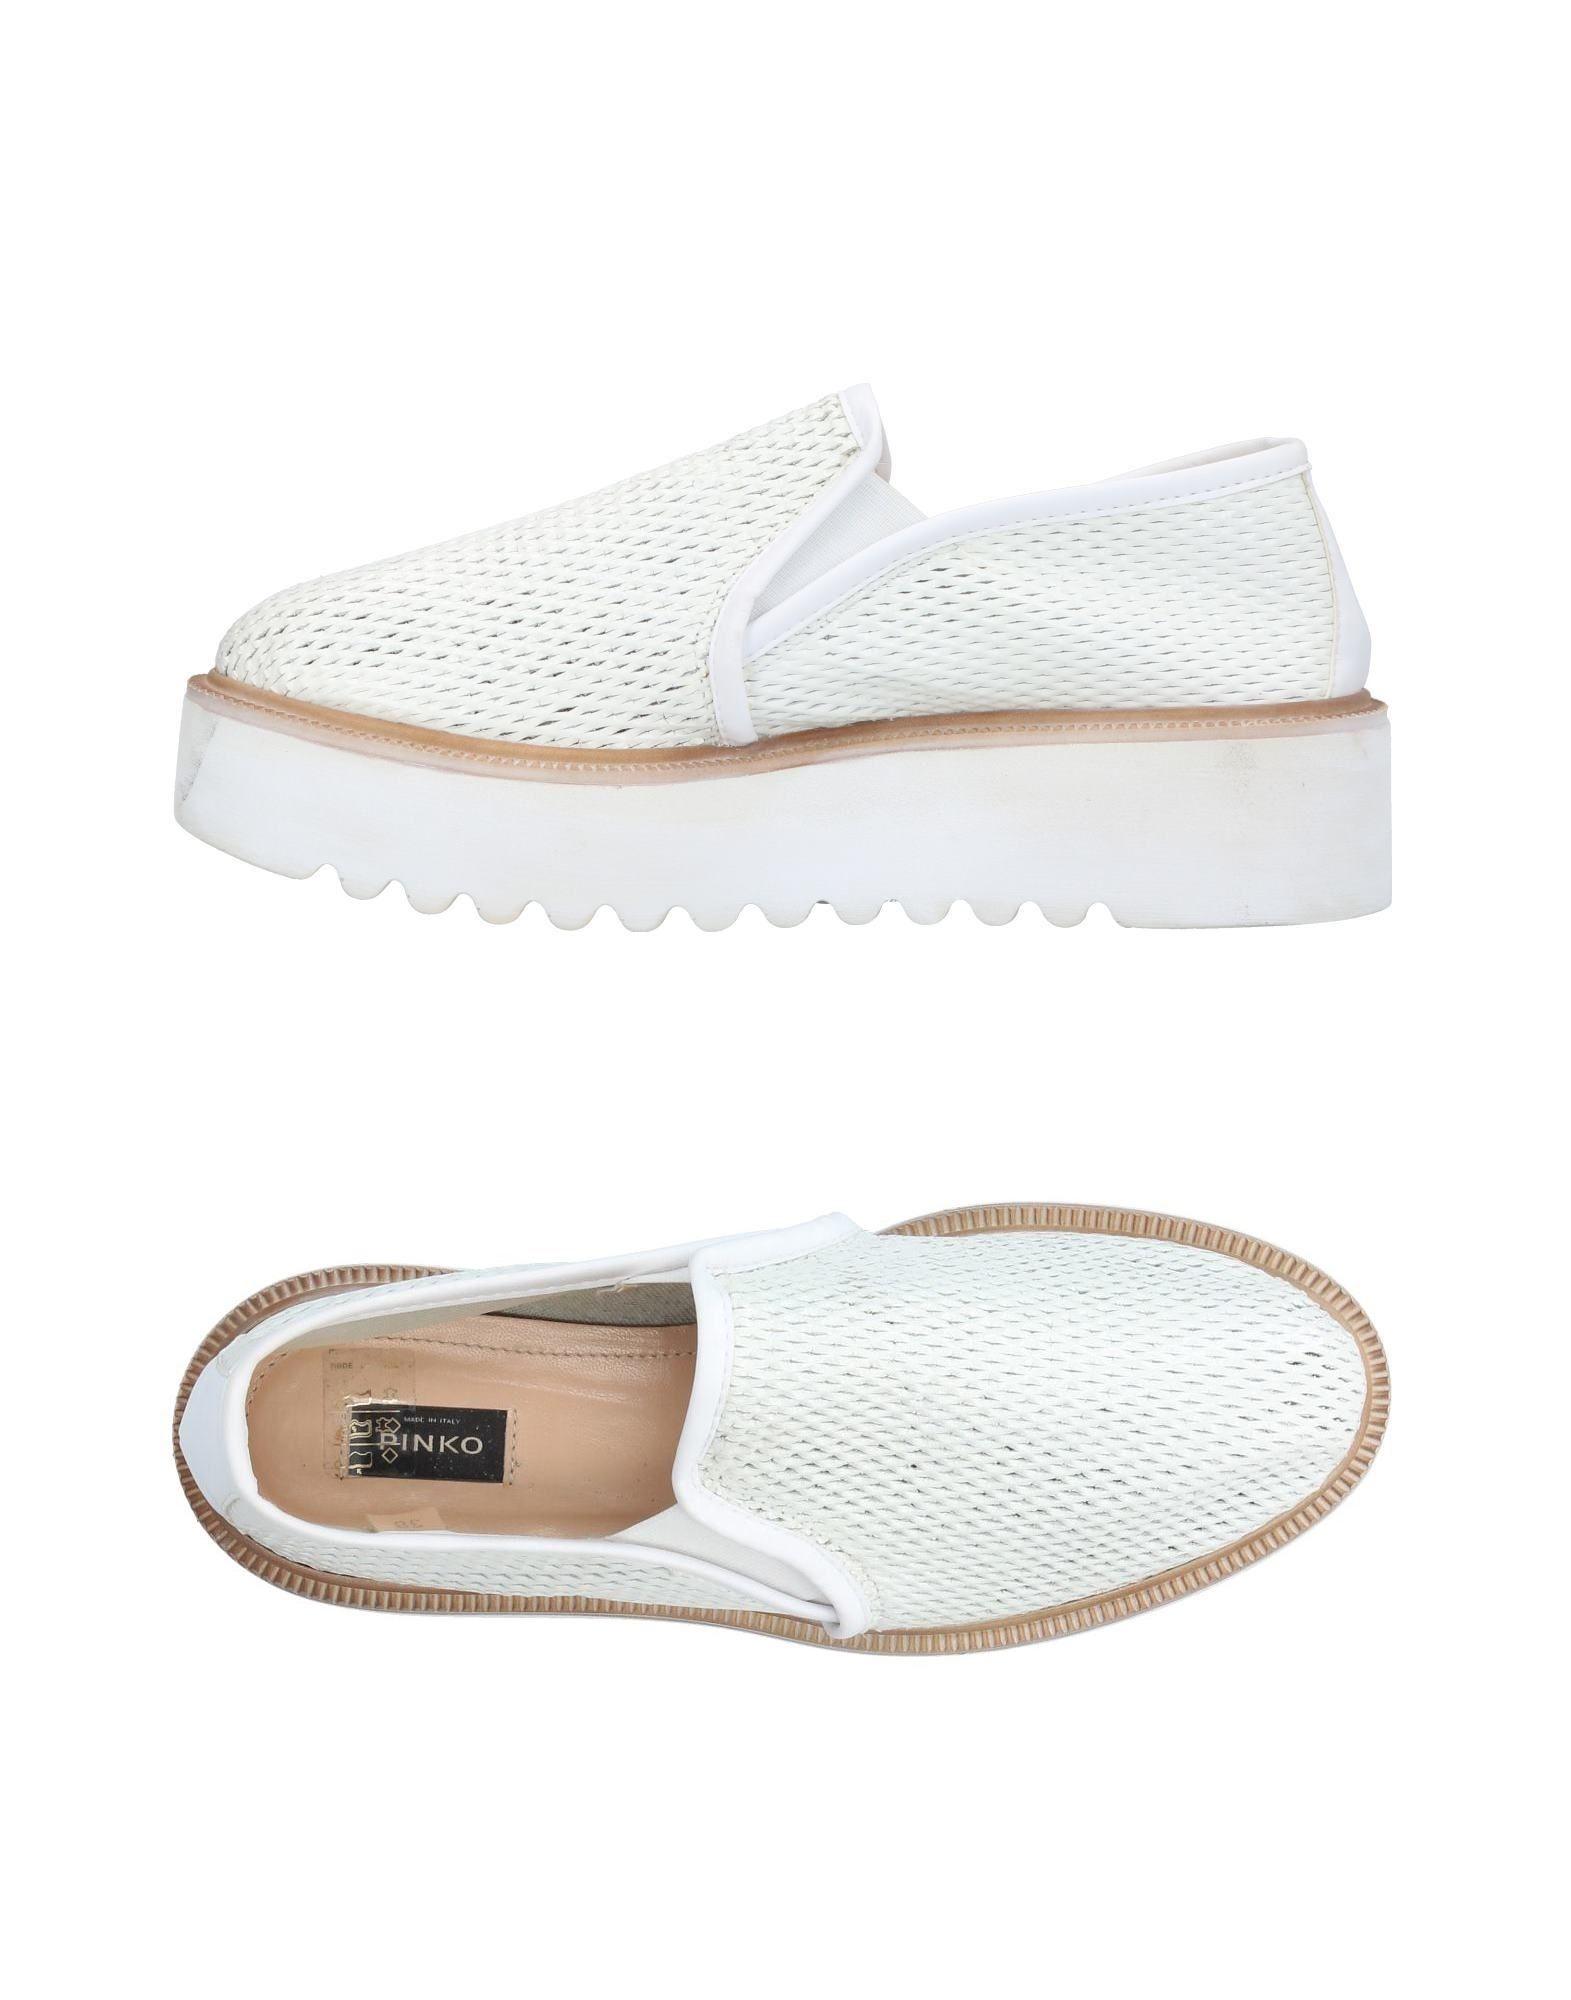 Moda Sneakers Sneakers Moda Pinko Donna - 11397370UX 3f00c1